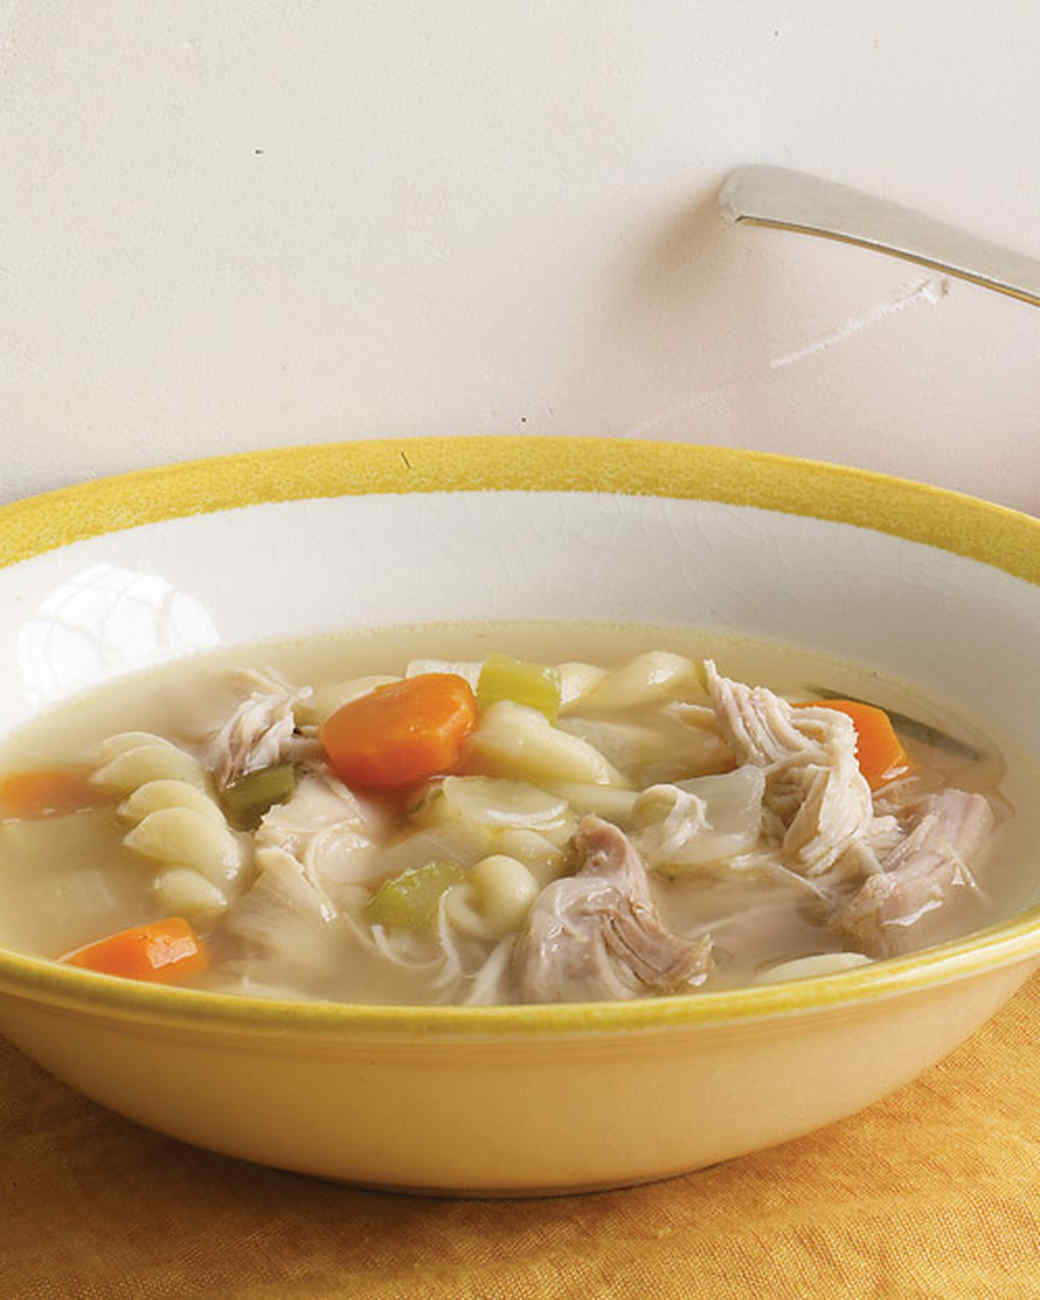 Homemade Turkey Noodle Soup